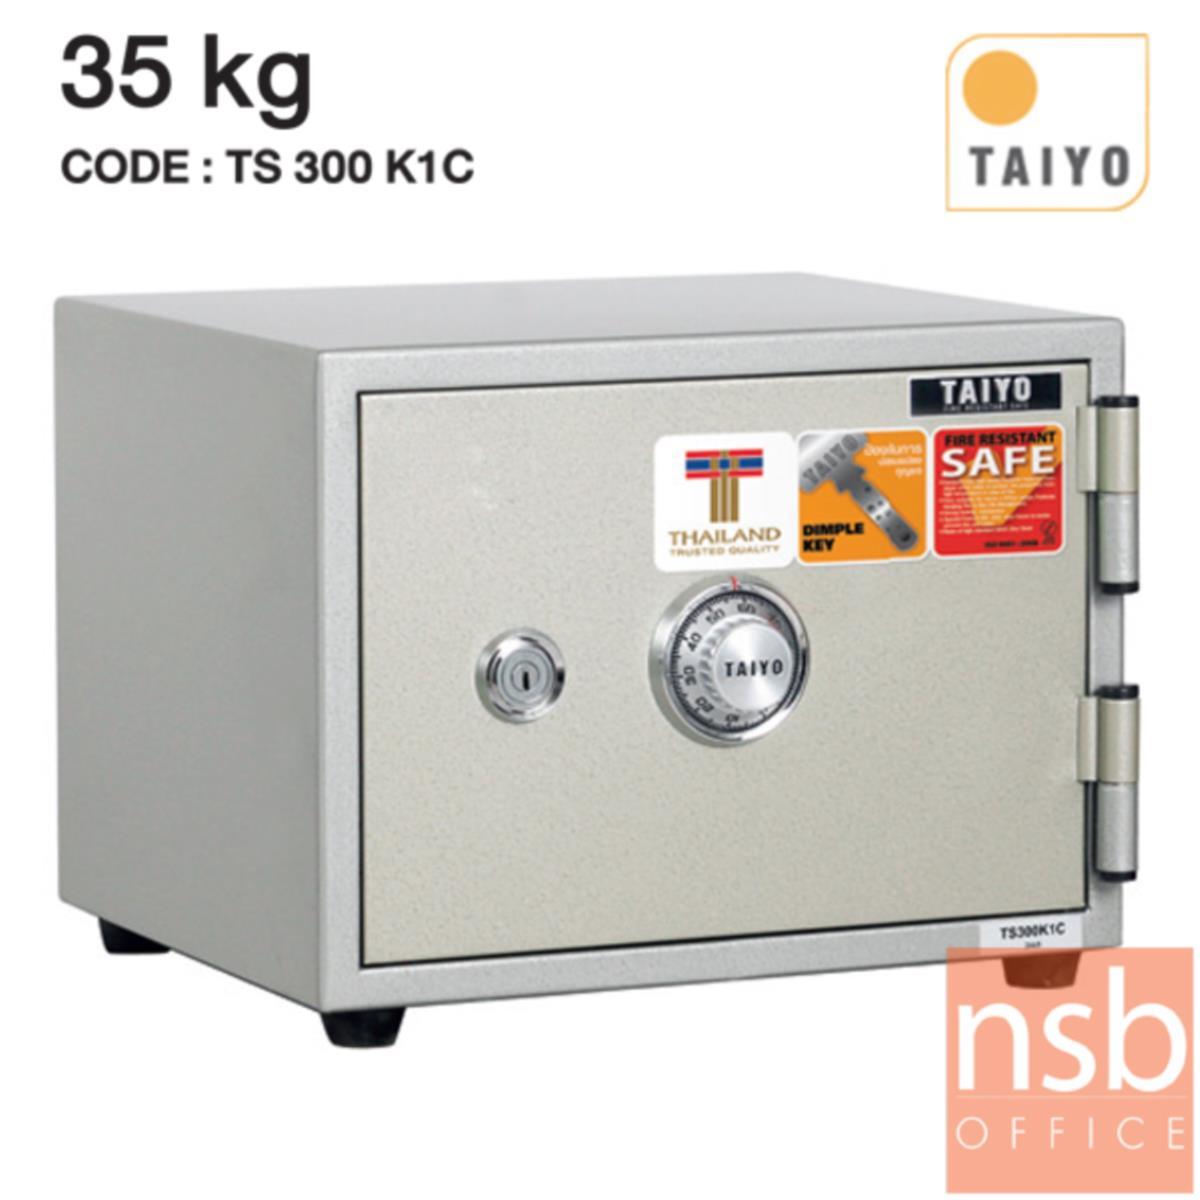 F01A002:ตู้เซฟ TAIYO 35 กก. 1 กุญแจ 1 รหัส   (TS 300 K1C)